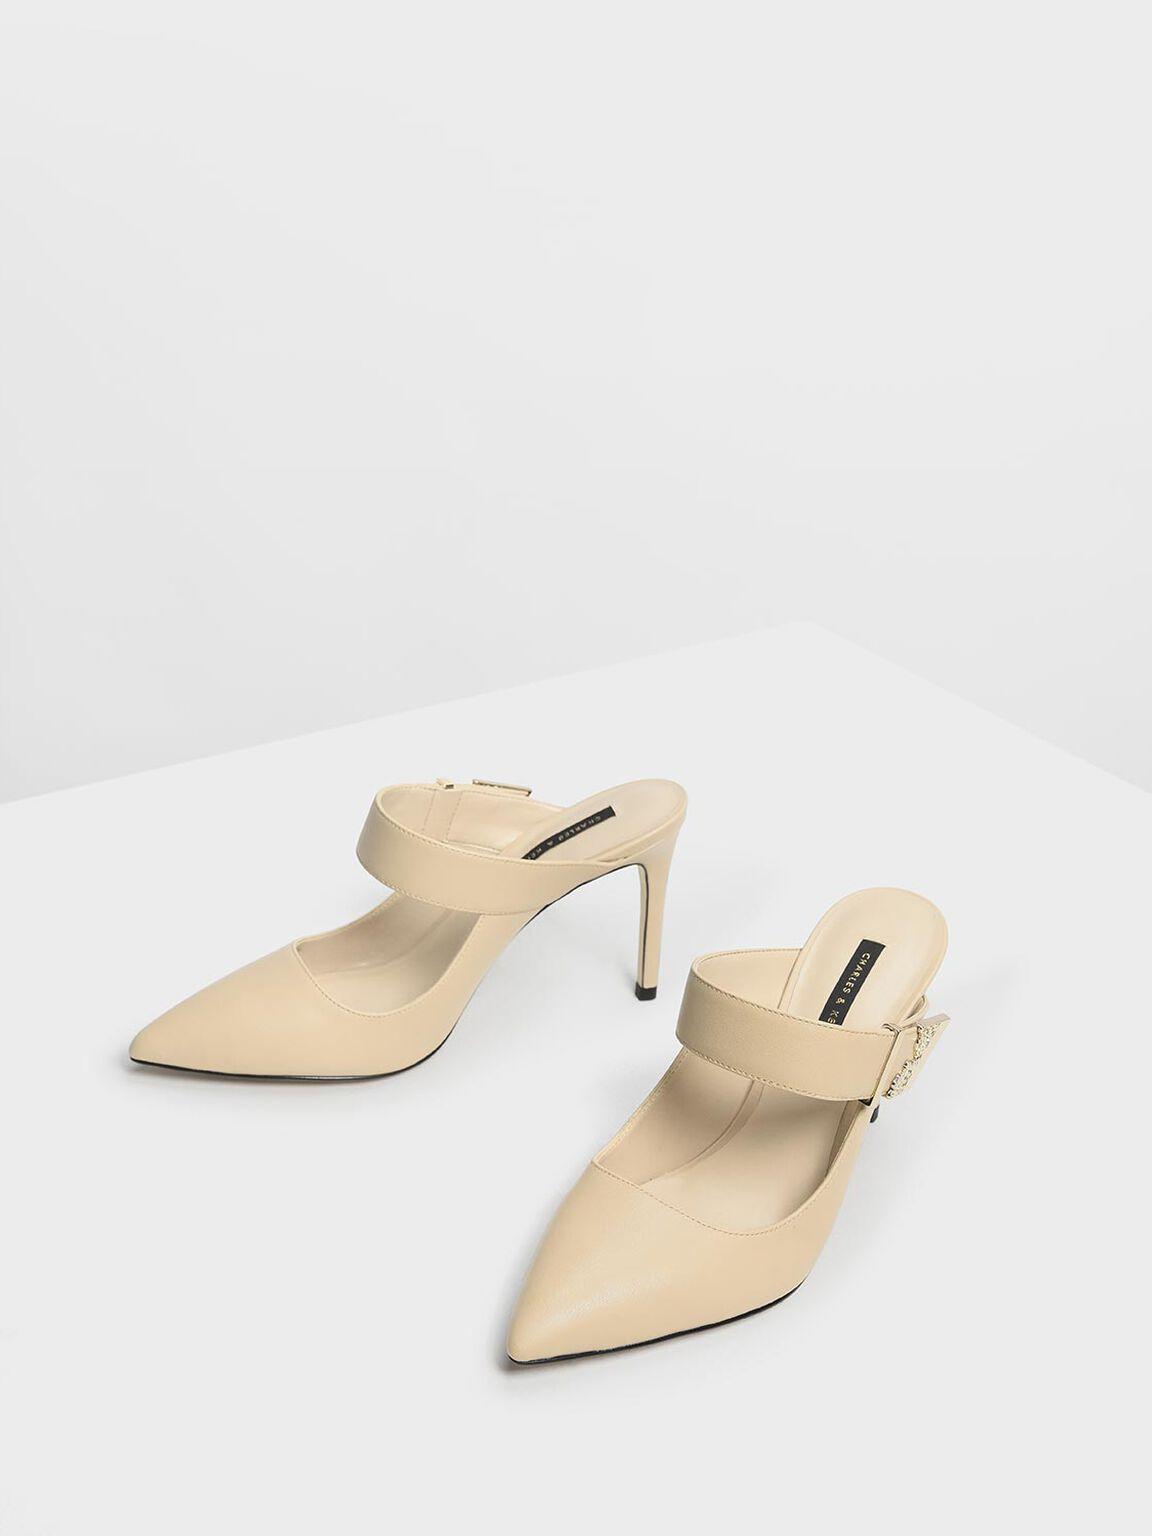 Shiny Ornamental Tab Buckle Heels, Sand, hi-res